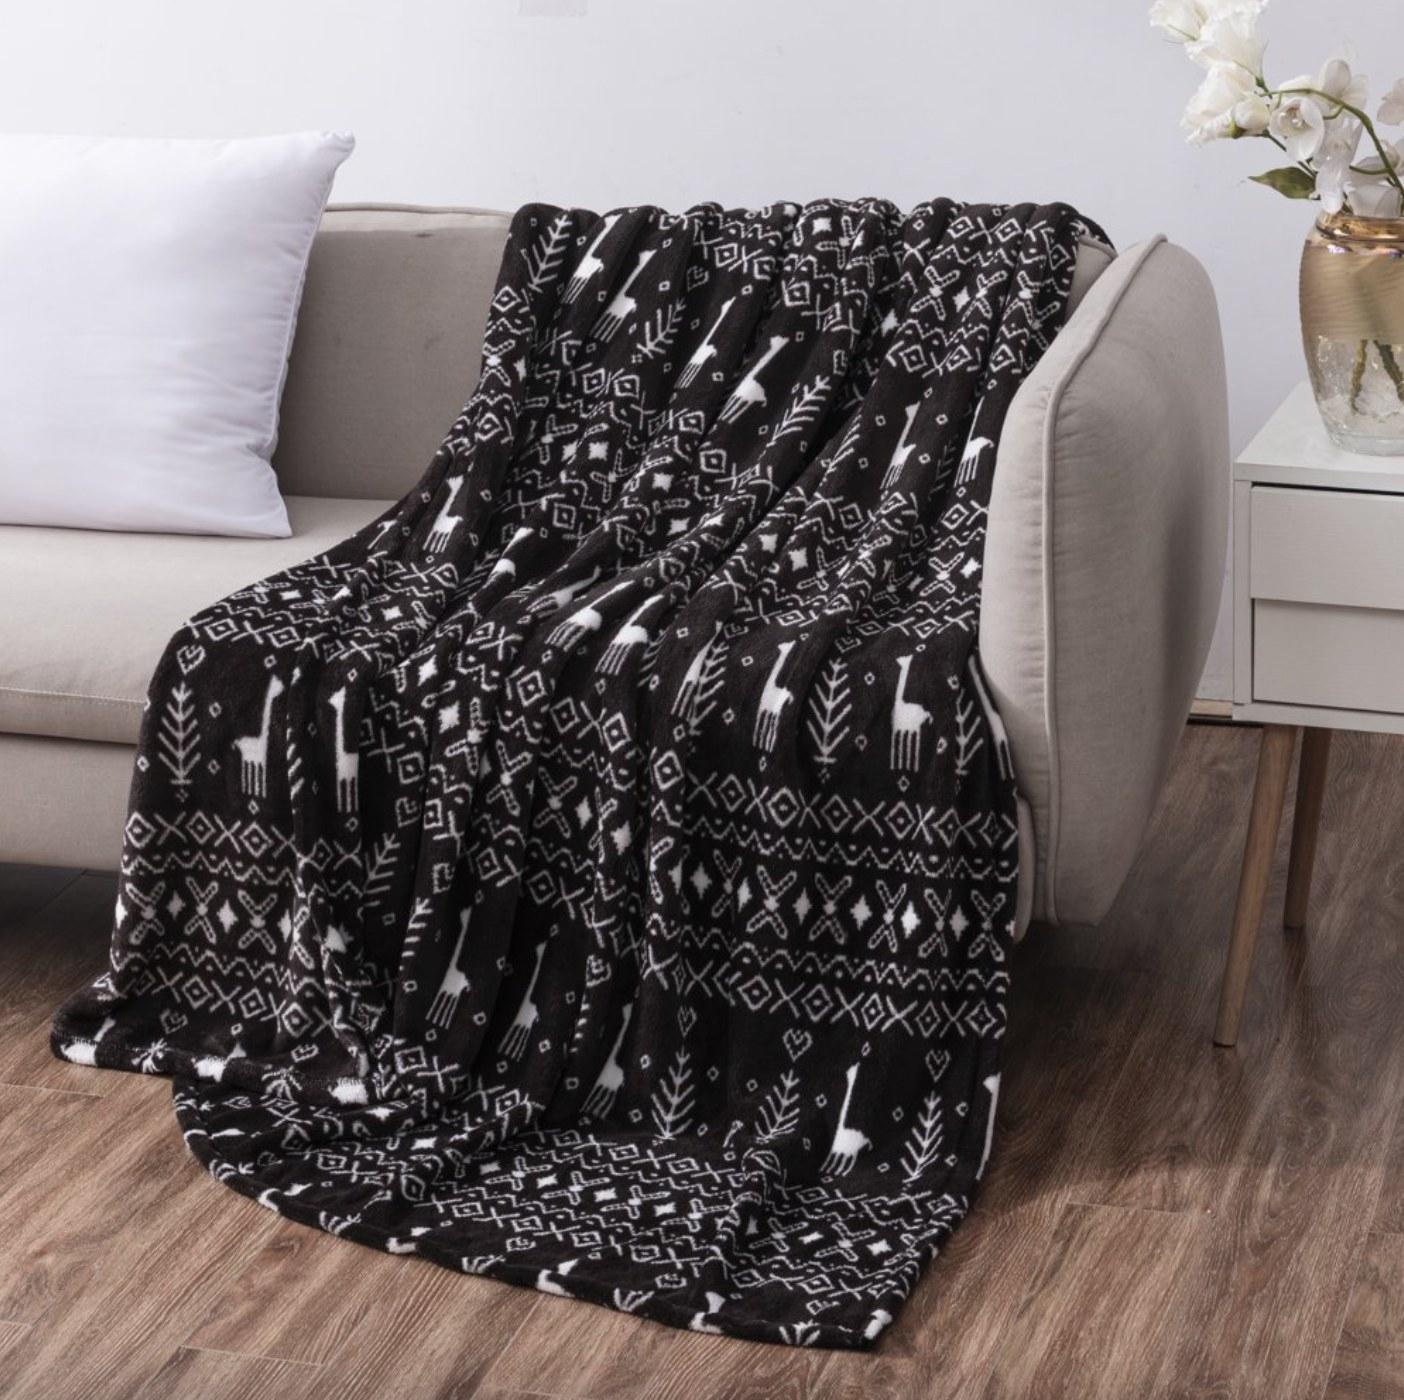 the blanket in black fairisle